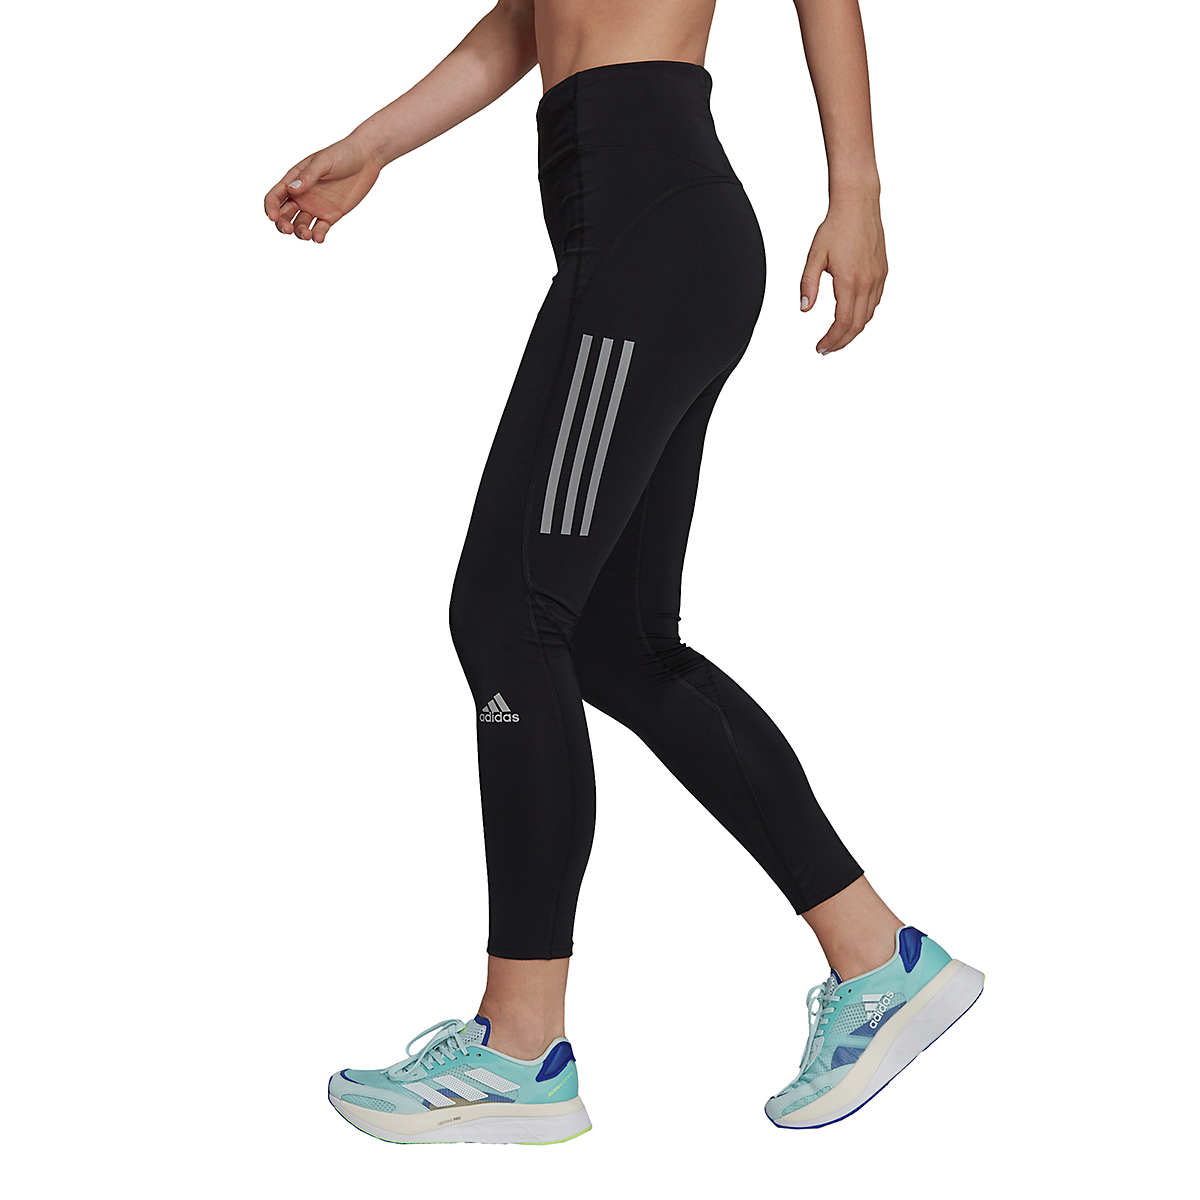 Women's Adidas Own The Run Running Leggings, , large, image 5